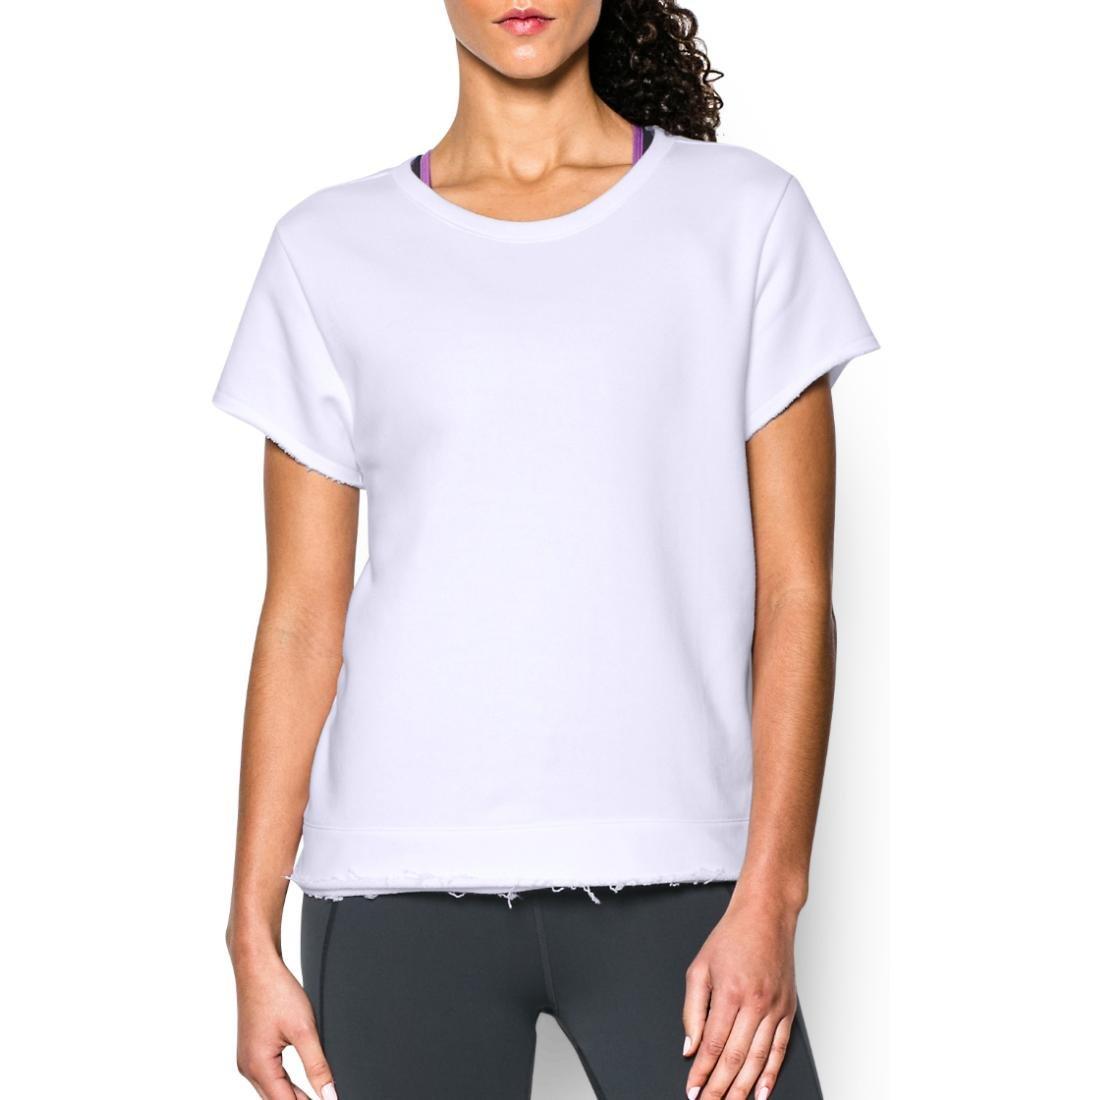 Under Armour Women's Boxy Studio Crew T-Shirt